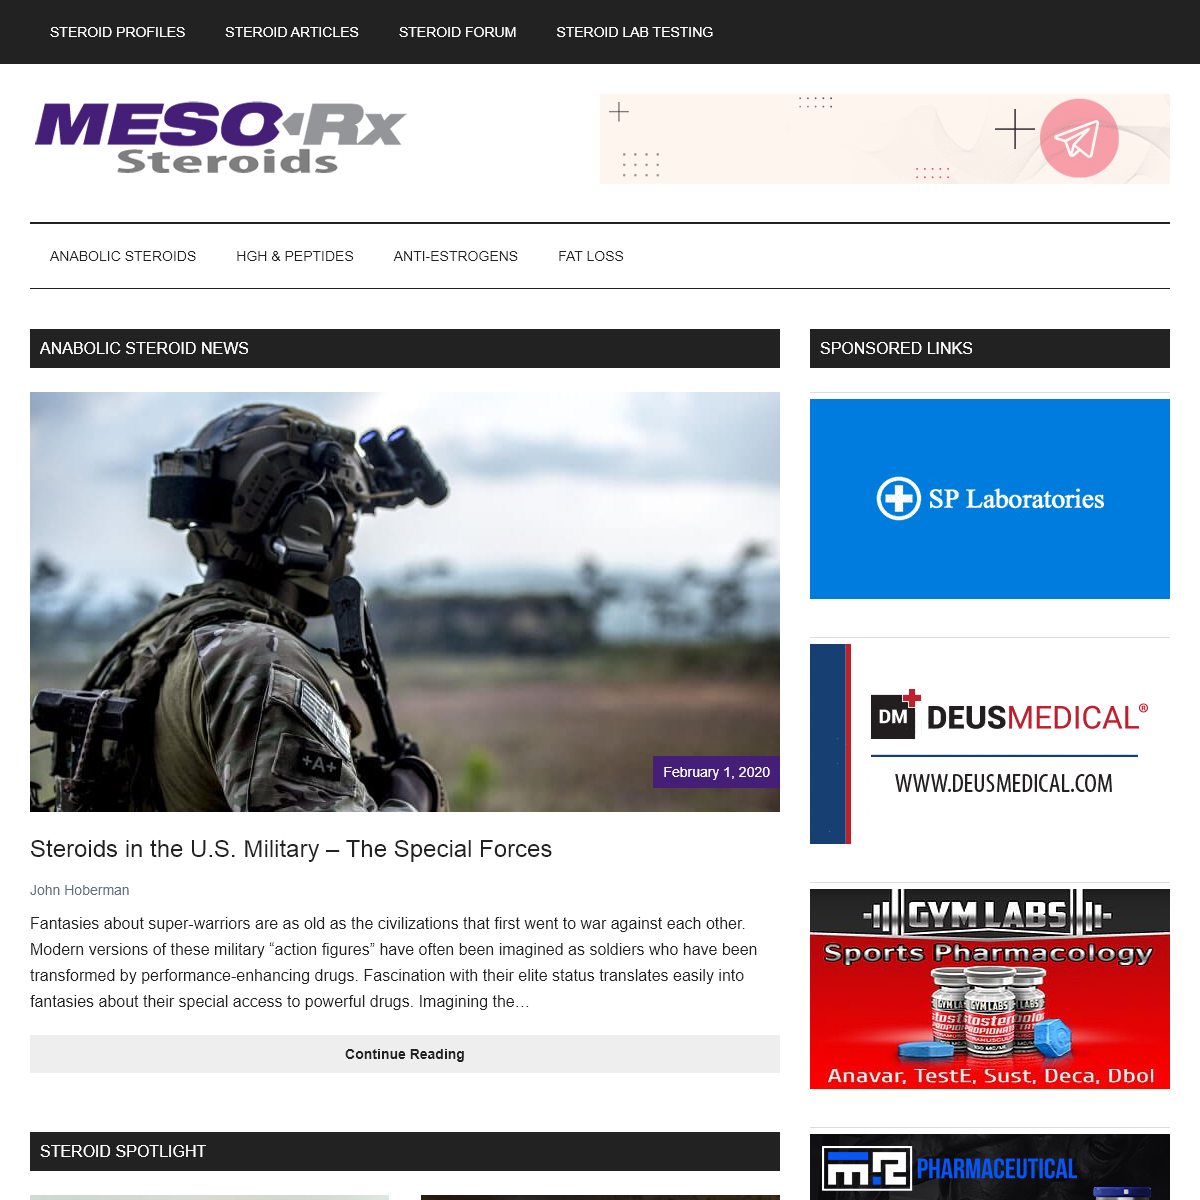 MESO-Rx Anabolic Steroids Info